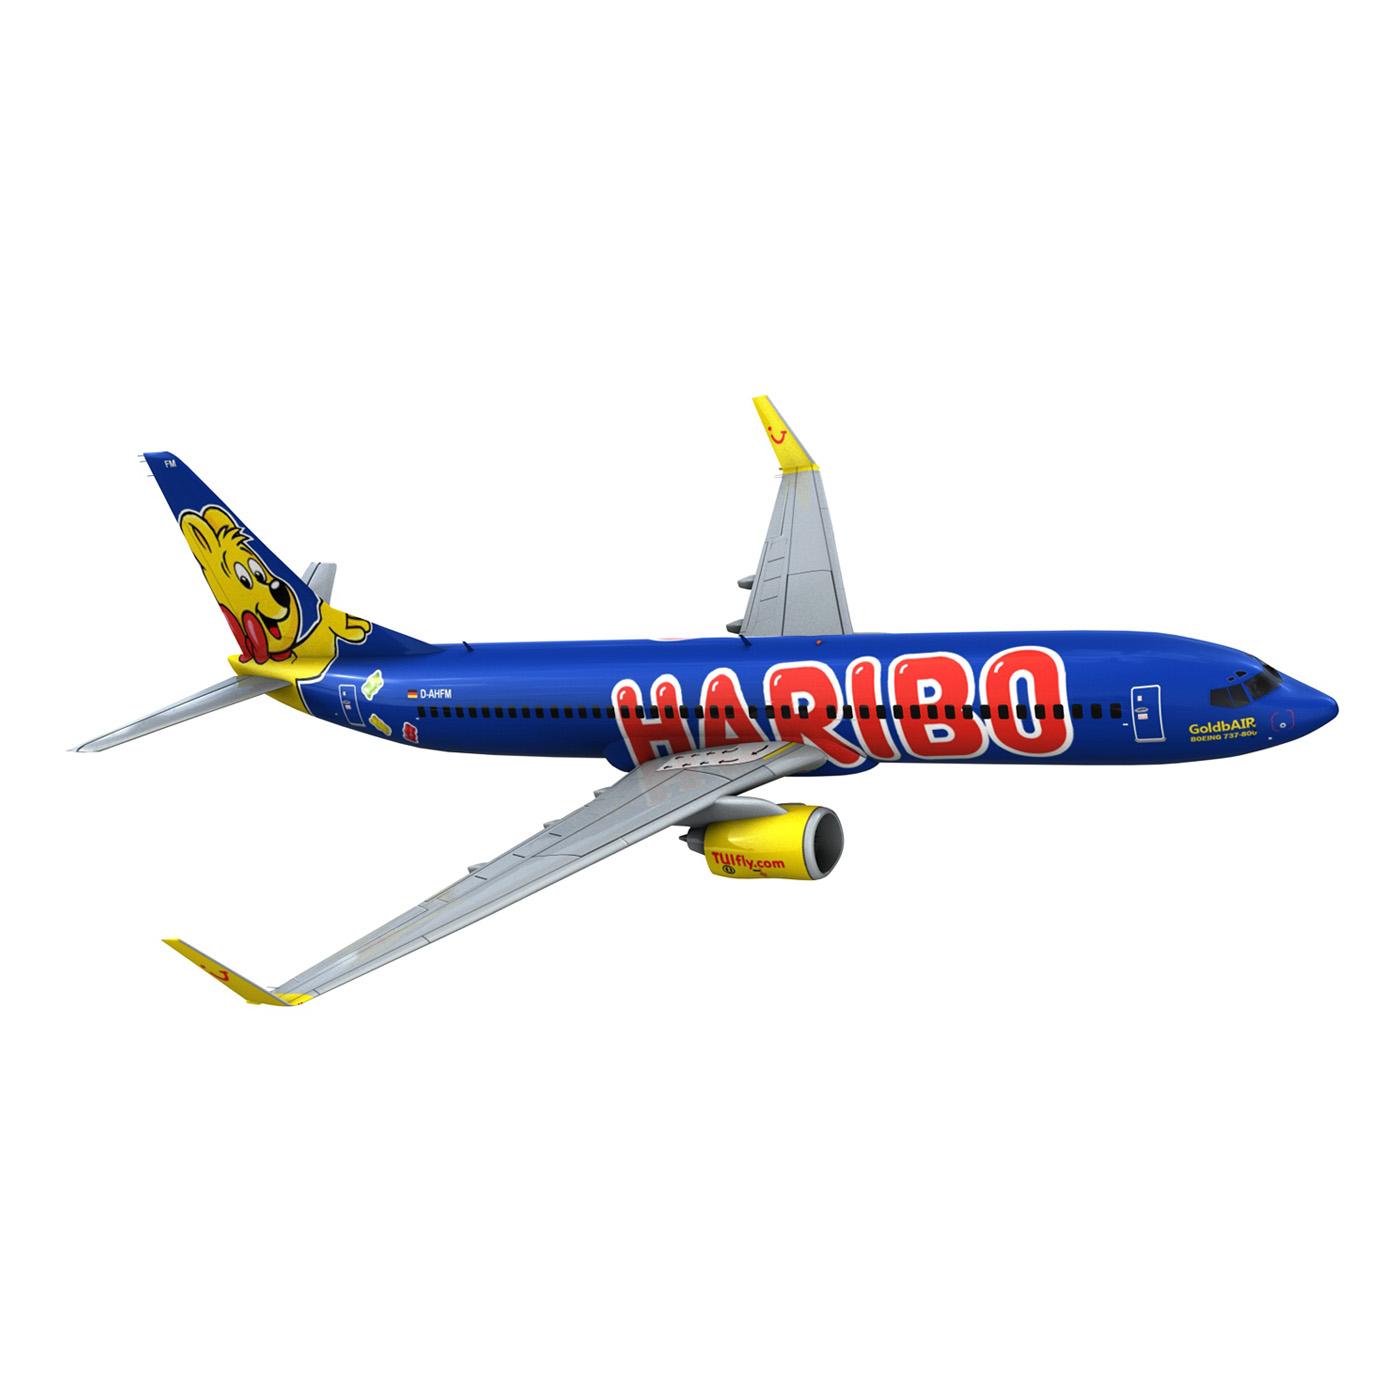 boeing 737-800 goldbair 3d model 3ds fbx c4d lwo obj 293504